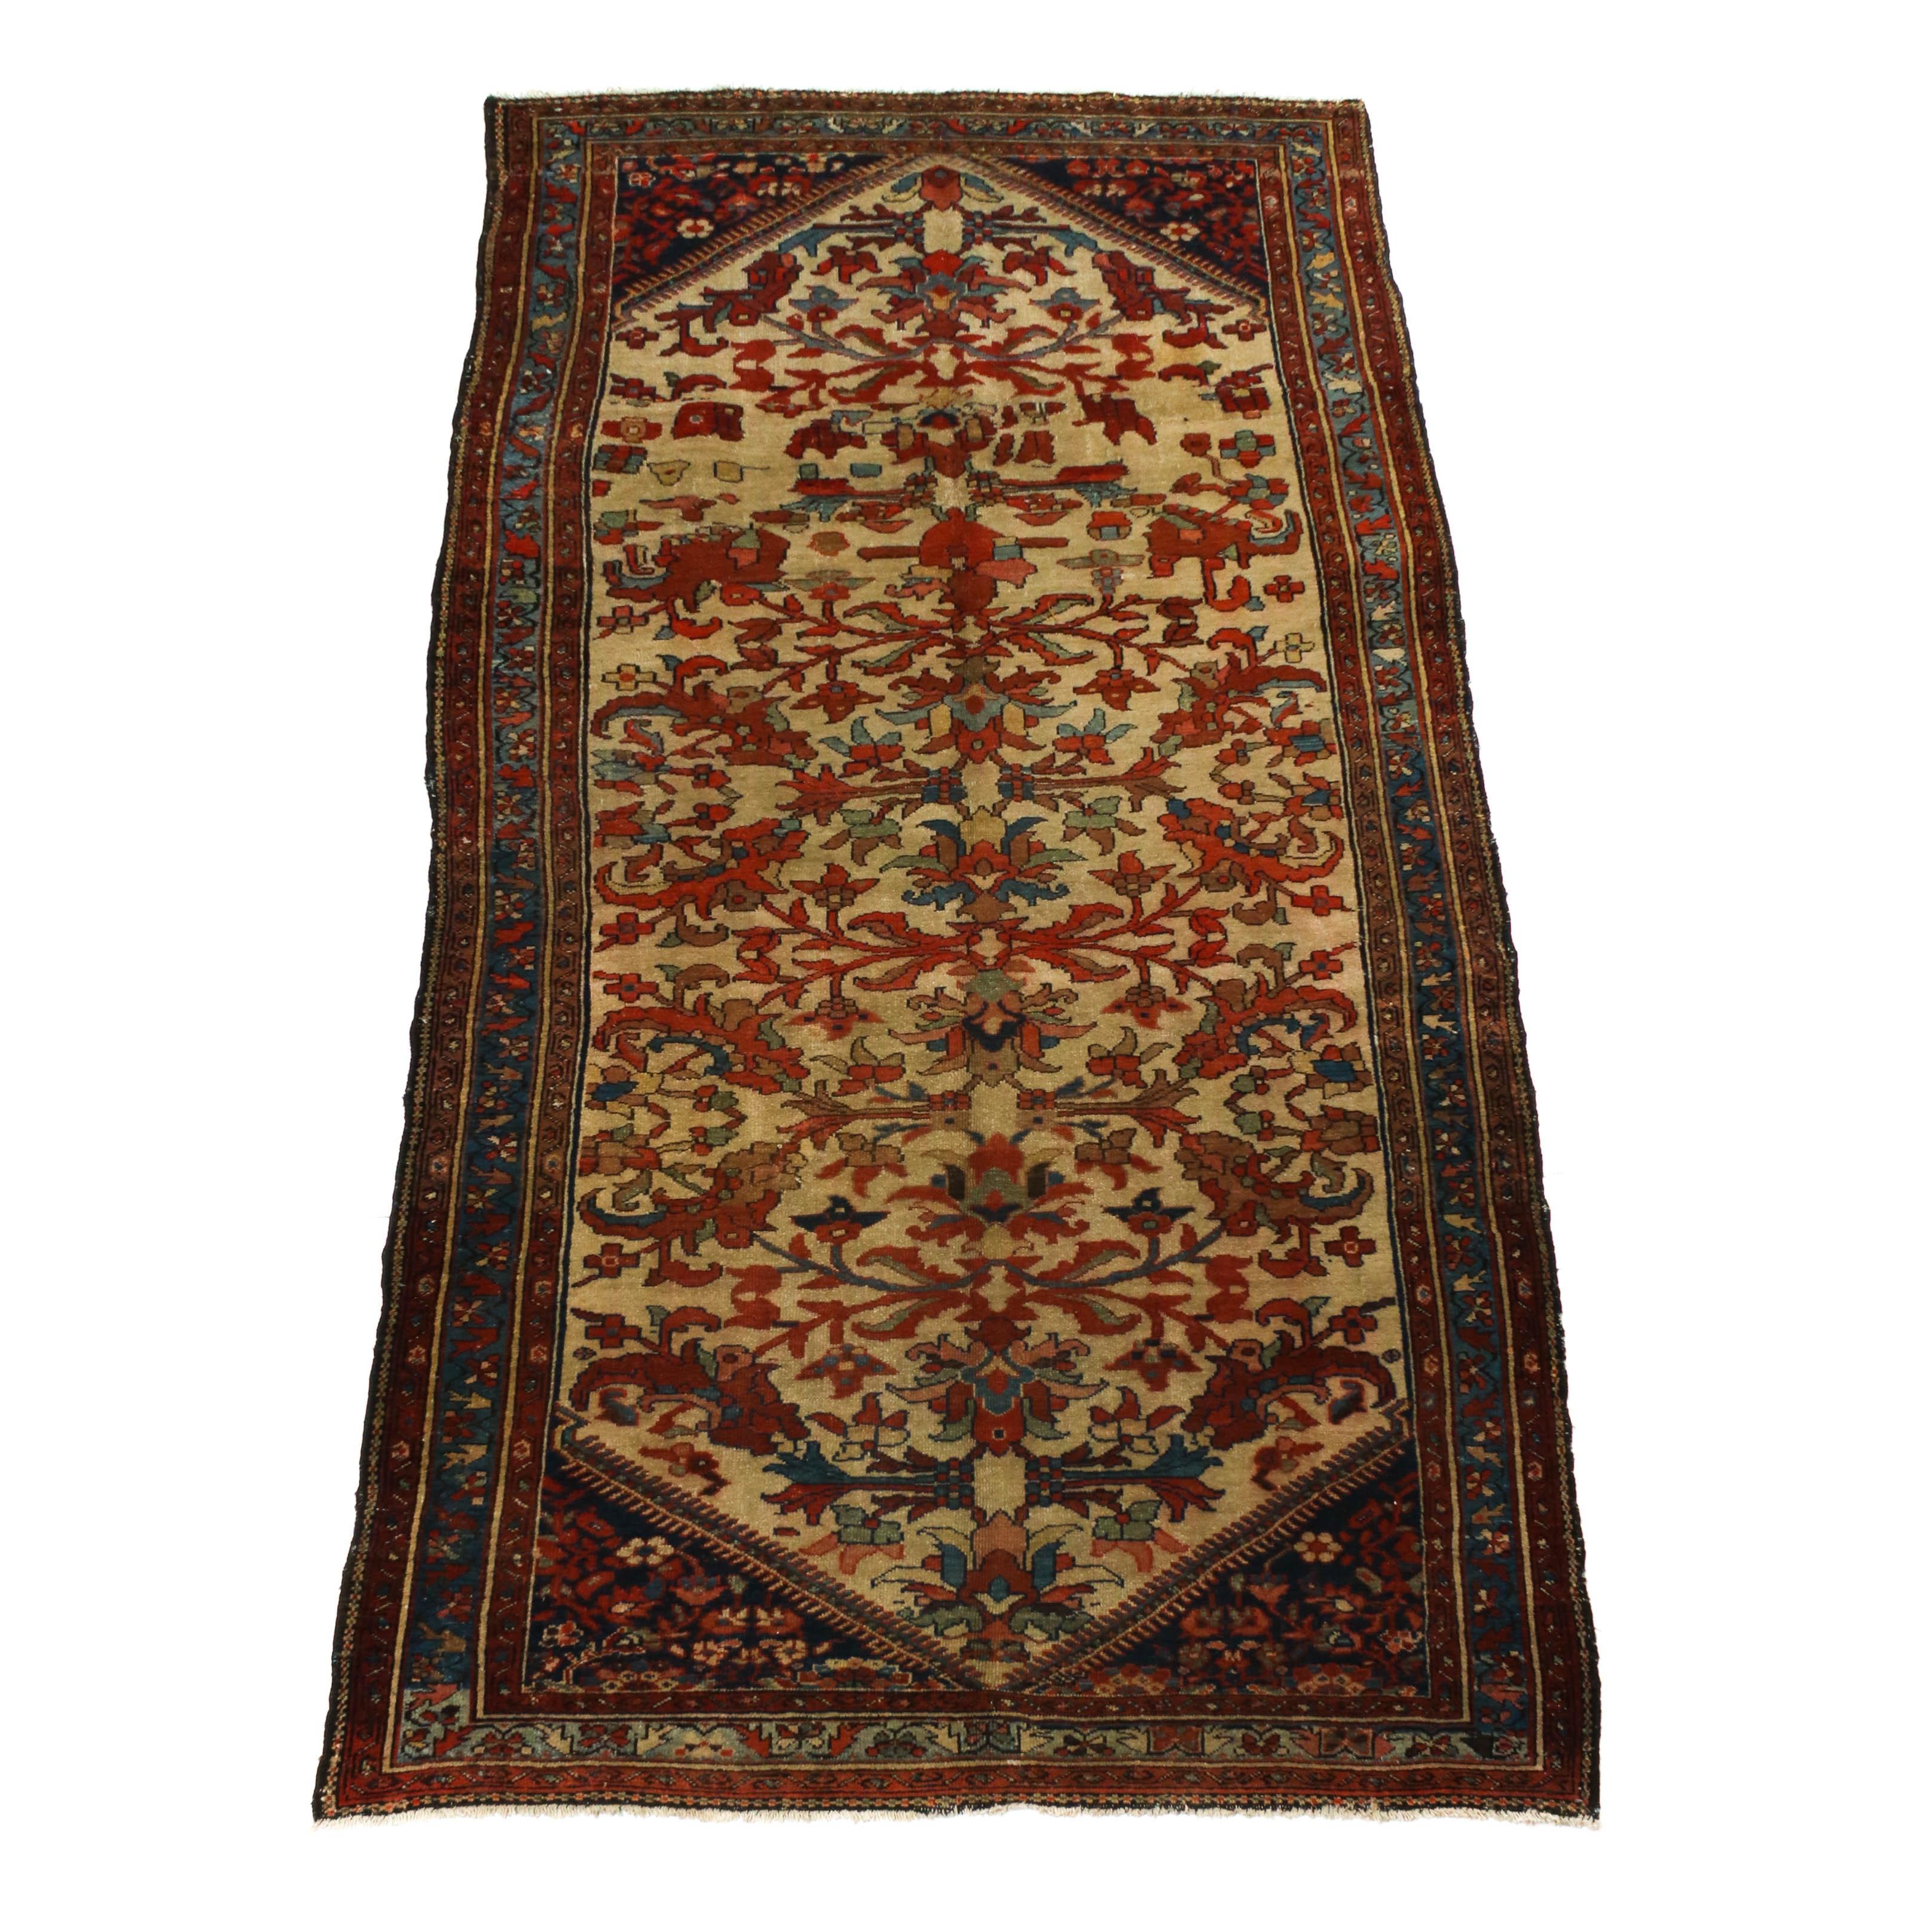 5'0 x 9'11 Hand-Knotted Persian Bakhtiari Wool Rug, Circa 1900